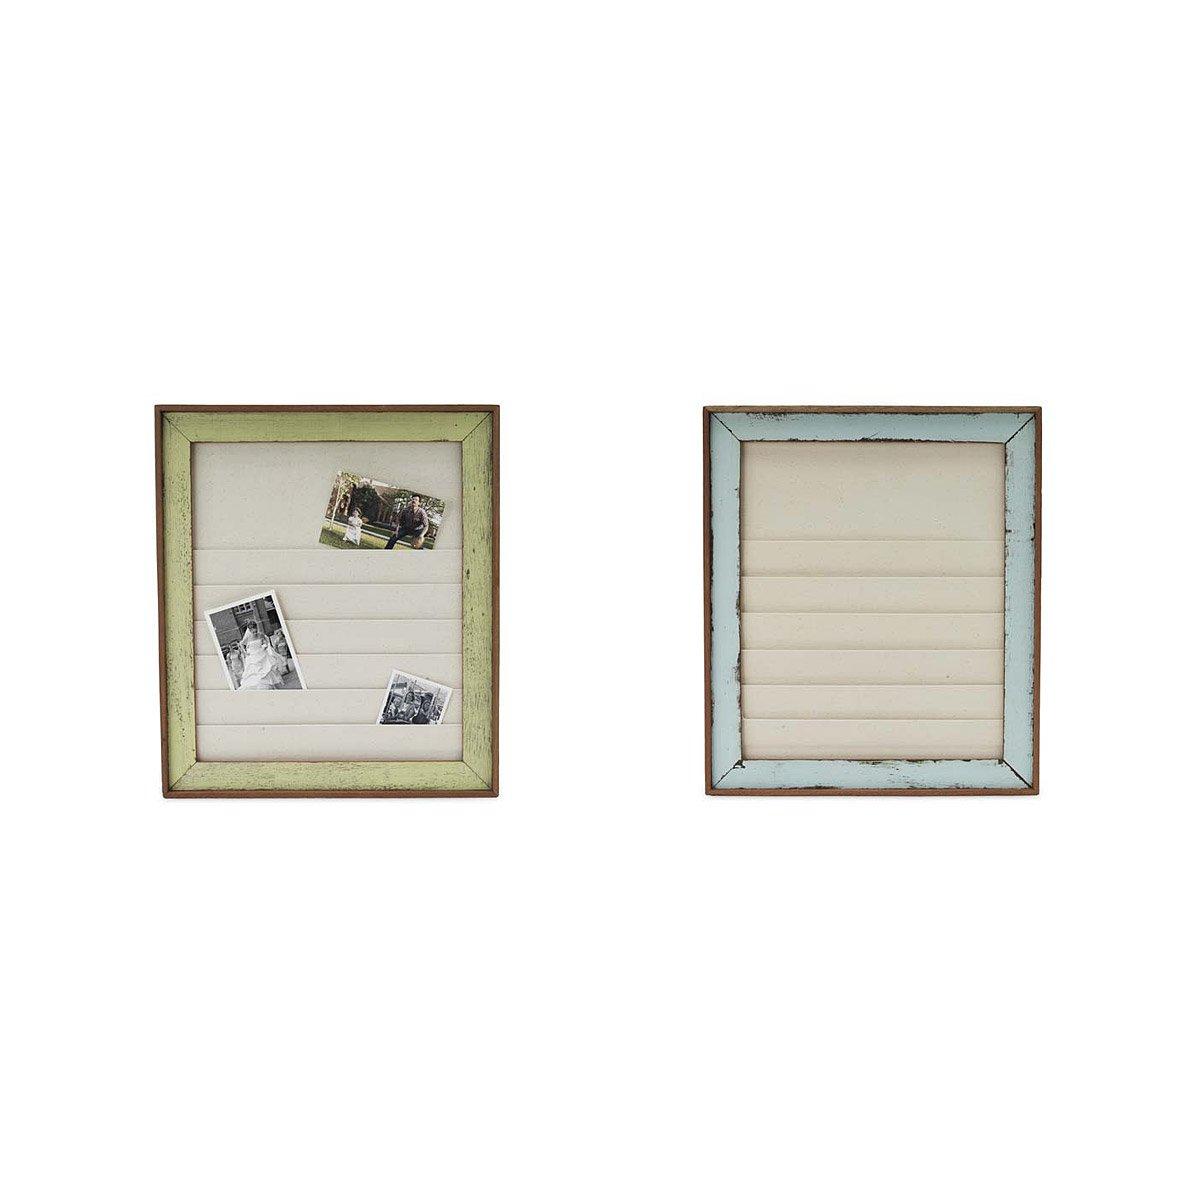 Canvas Letter Frames | Bulletin Board Alternative, Slip Letters In ...